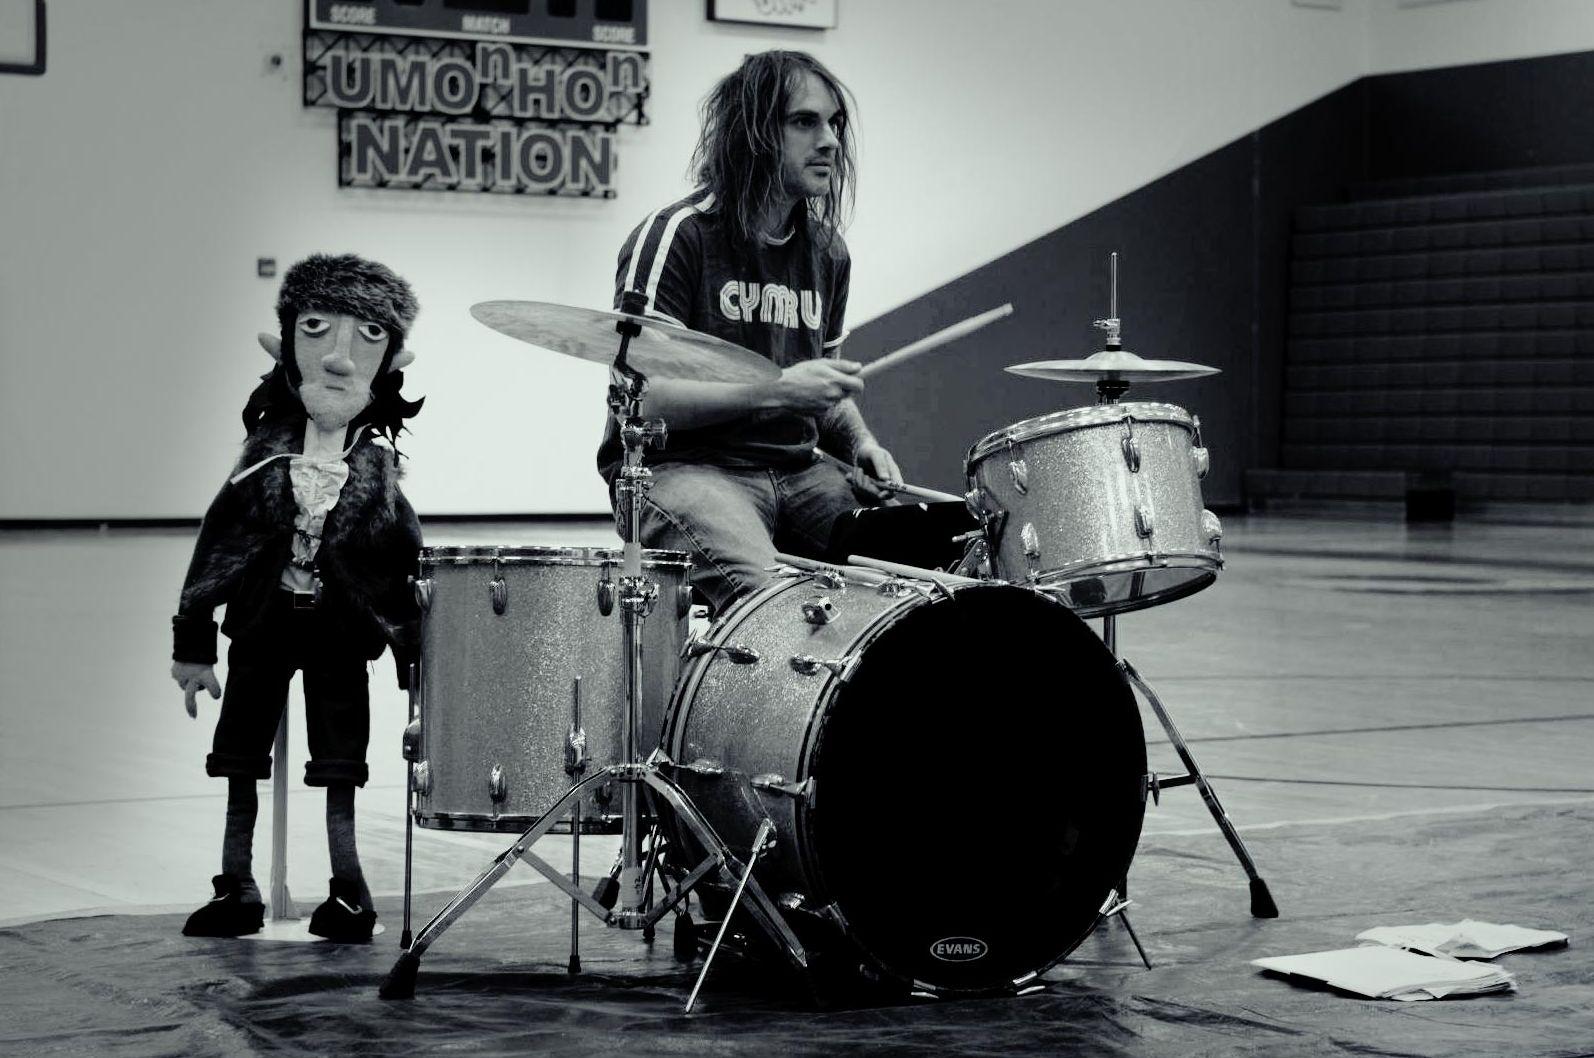 Drummer with John Evans puppet